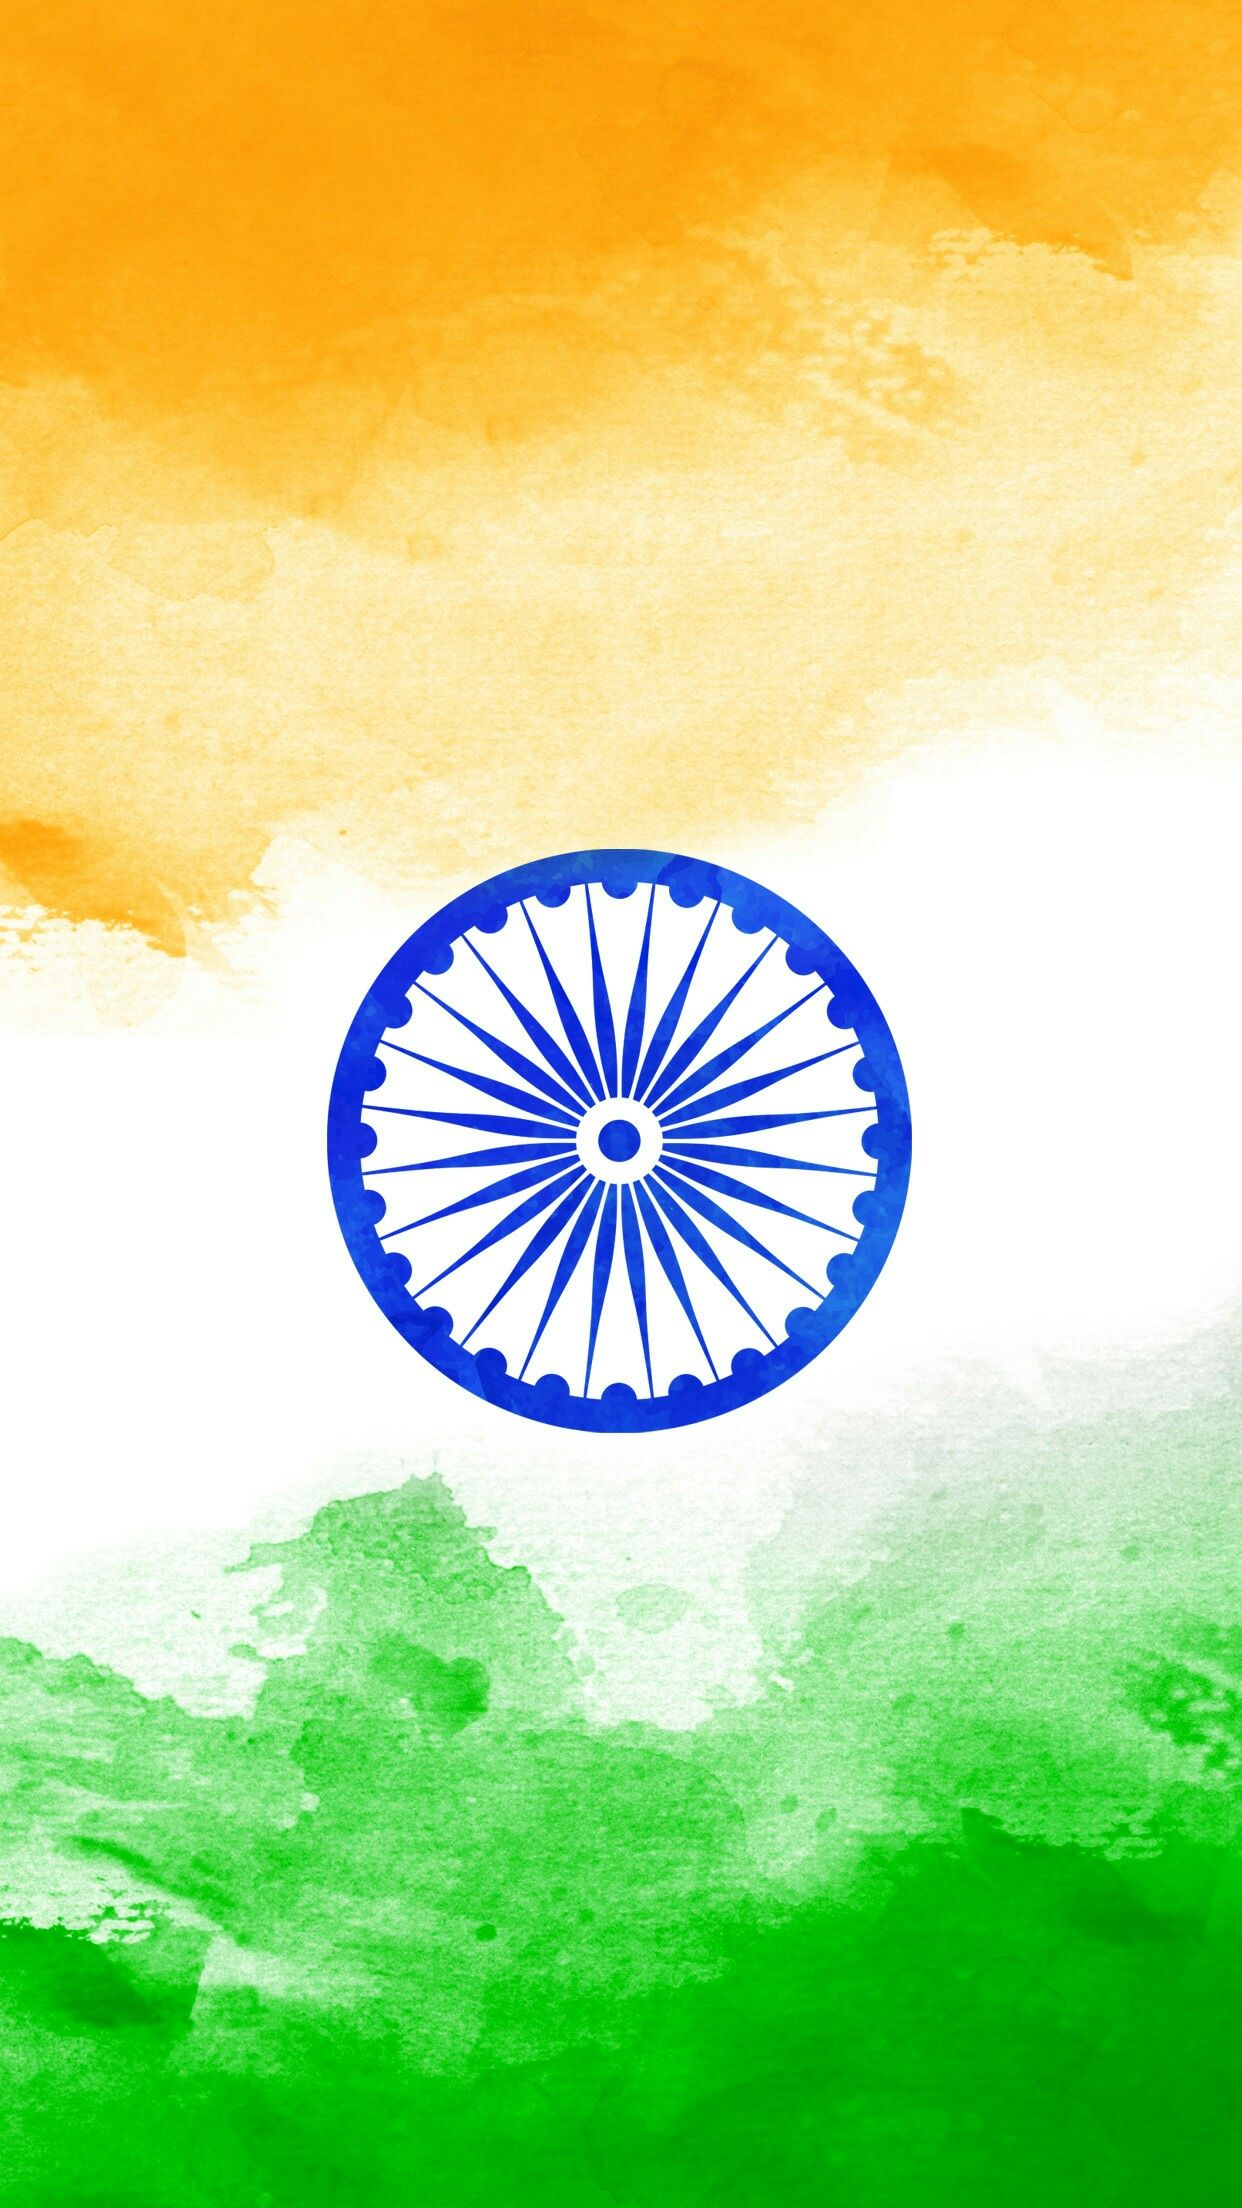 Pin by Abhinav on Mobile wallpaper in 2019 | Indian flag ...